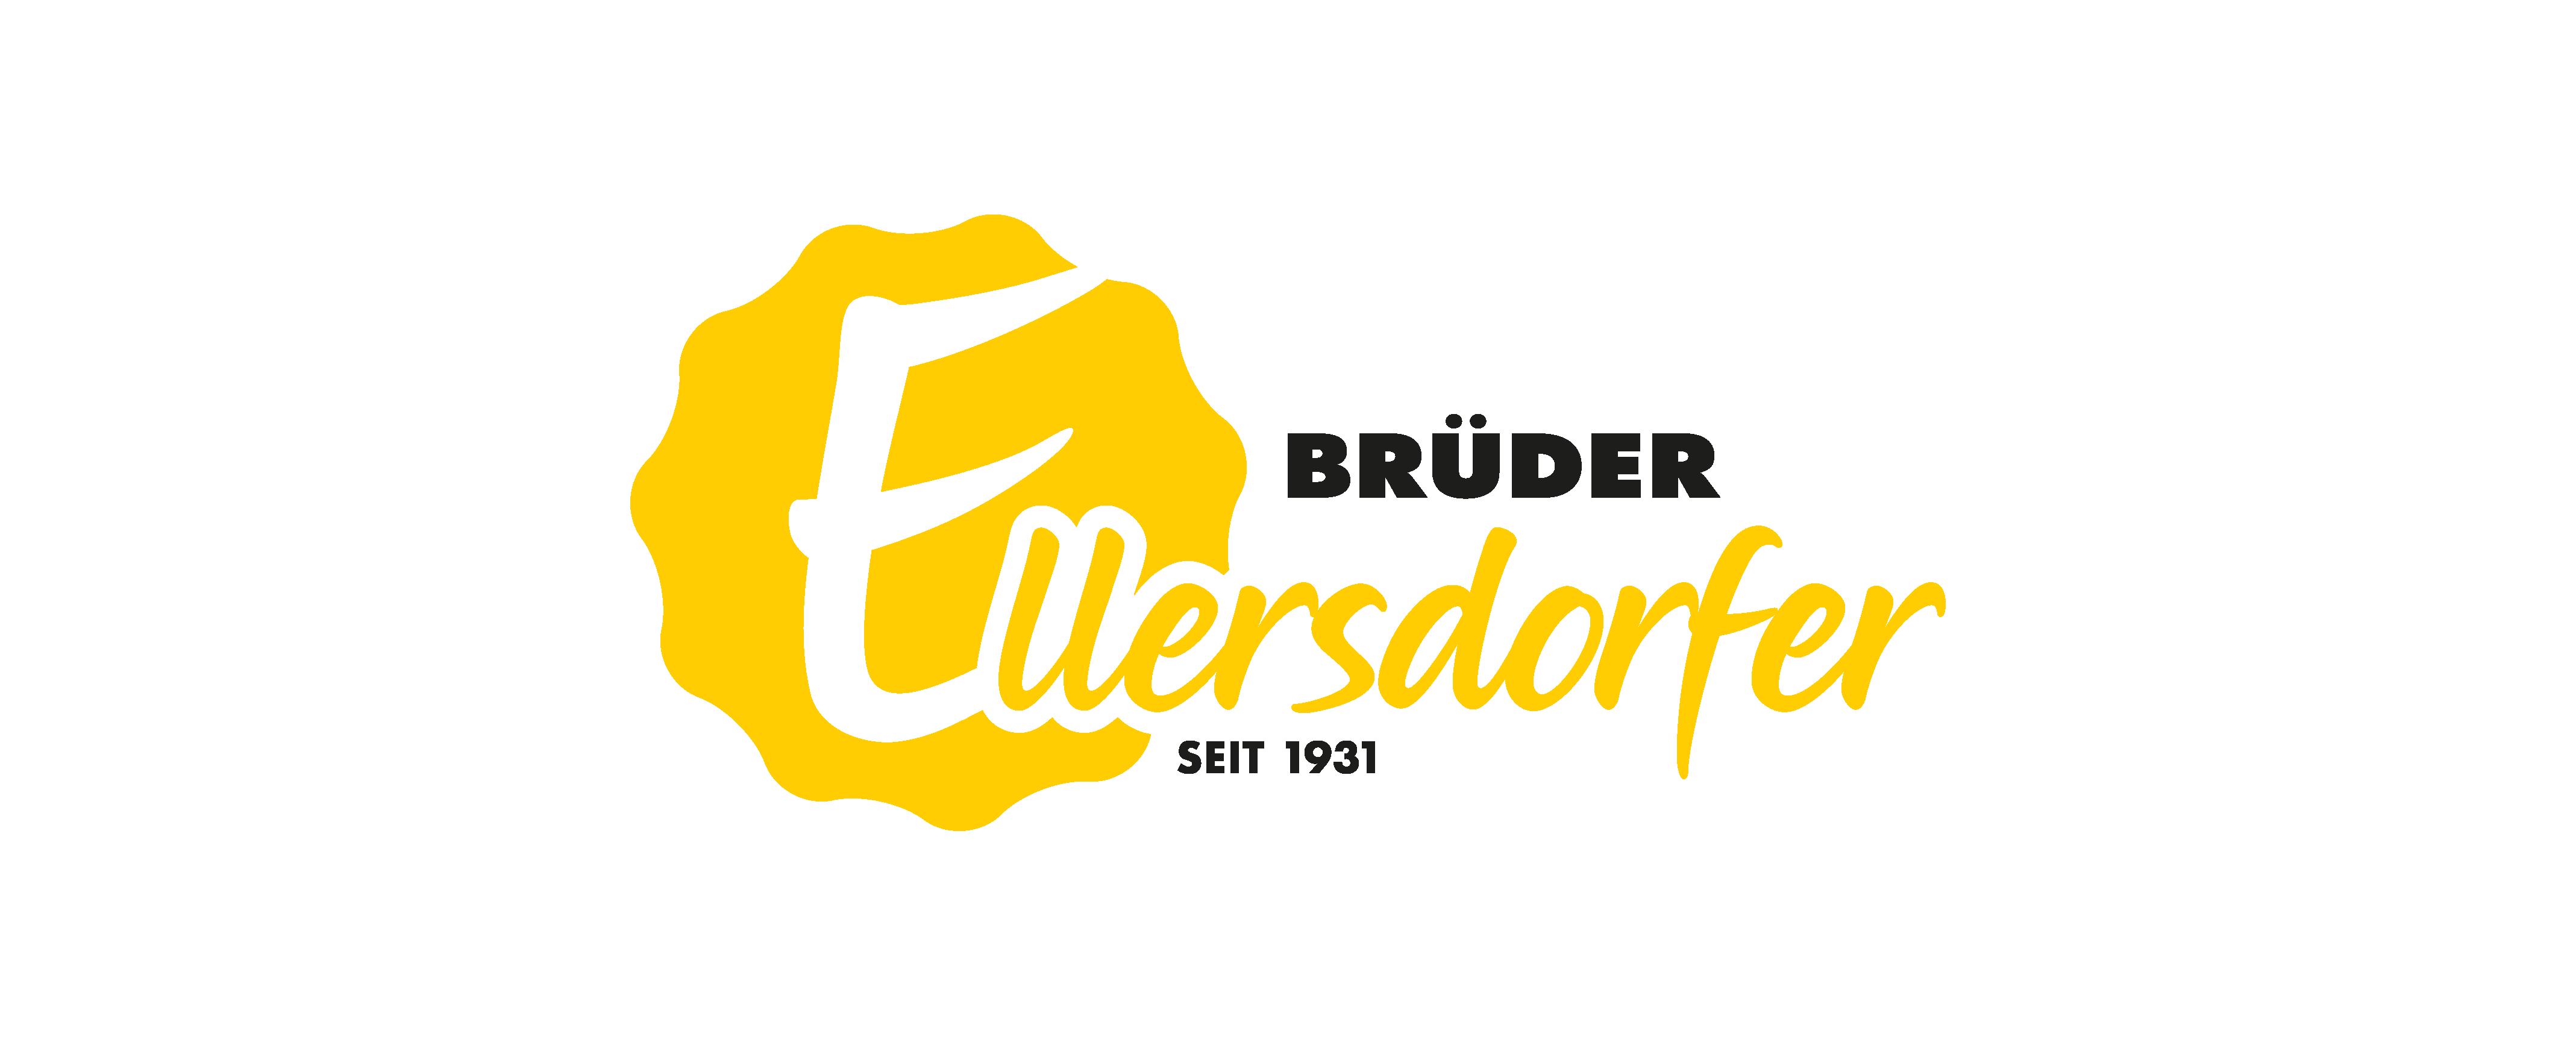 Brüder Ellersdorfer